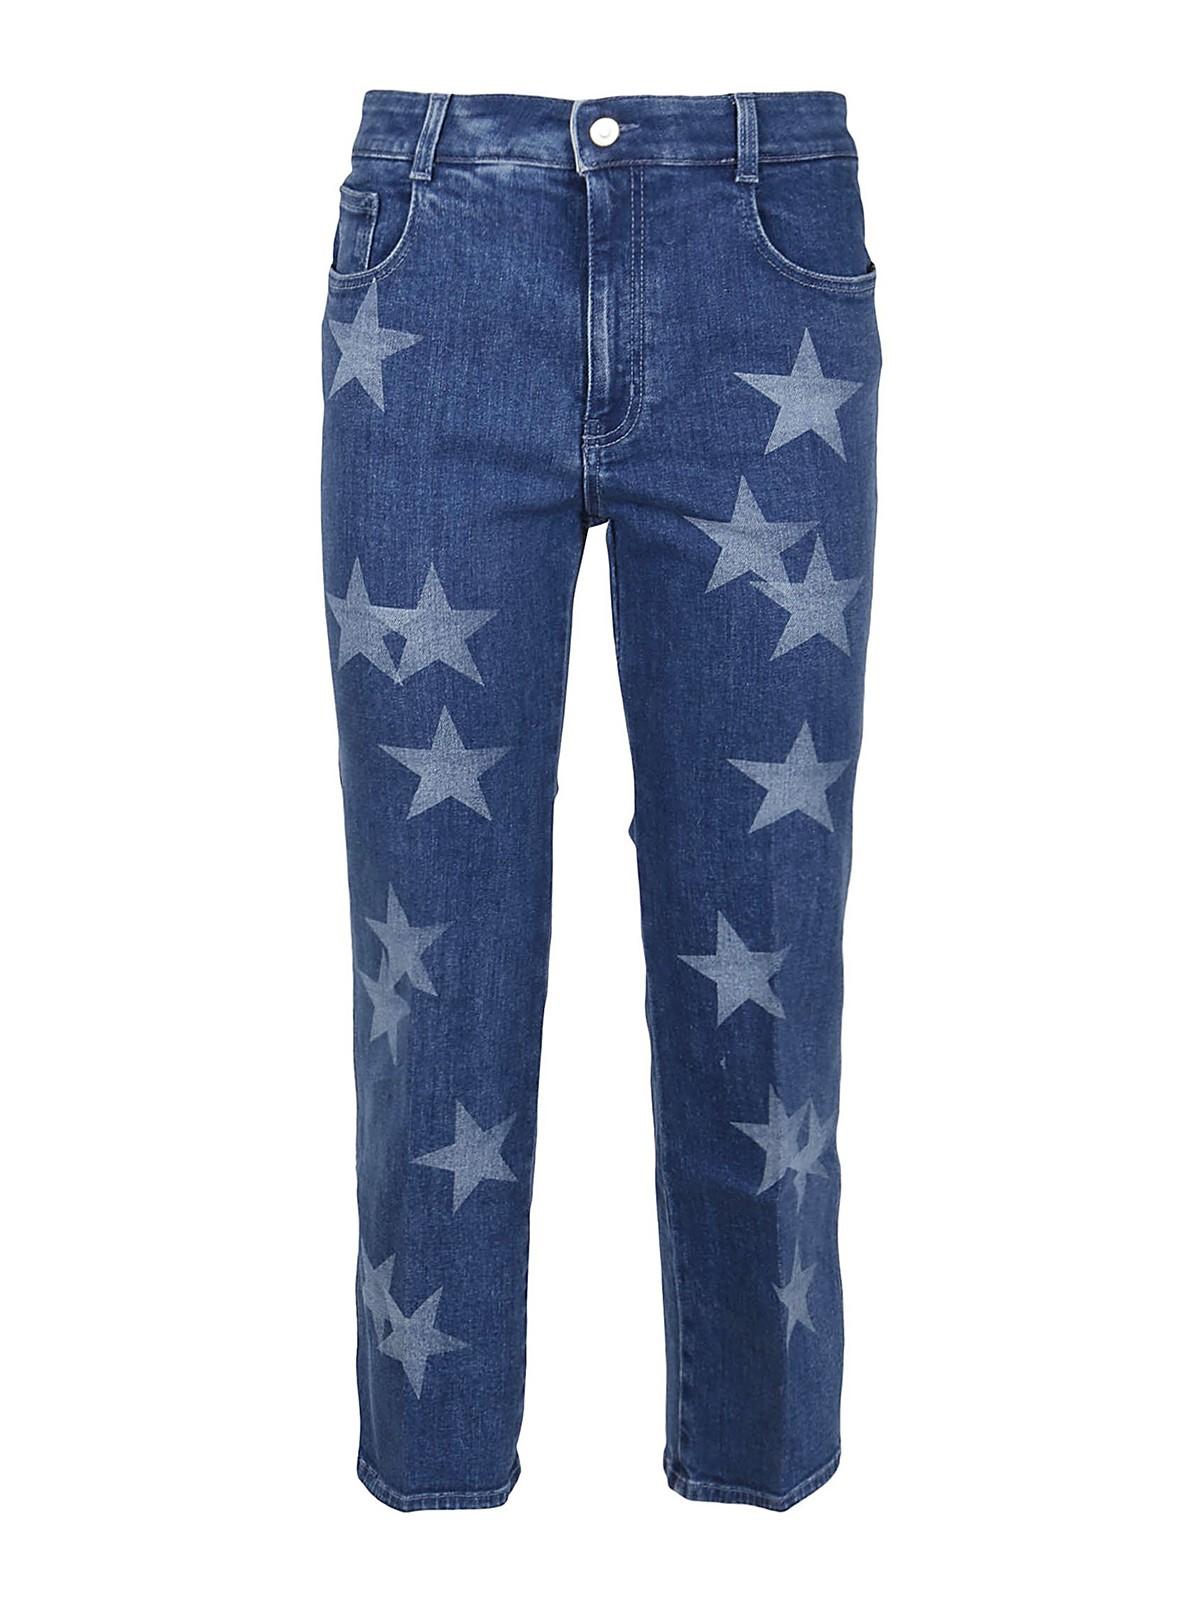 Stella Mccartney Cottons STAR PRINT STRETCH JEANS